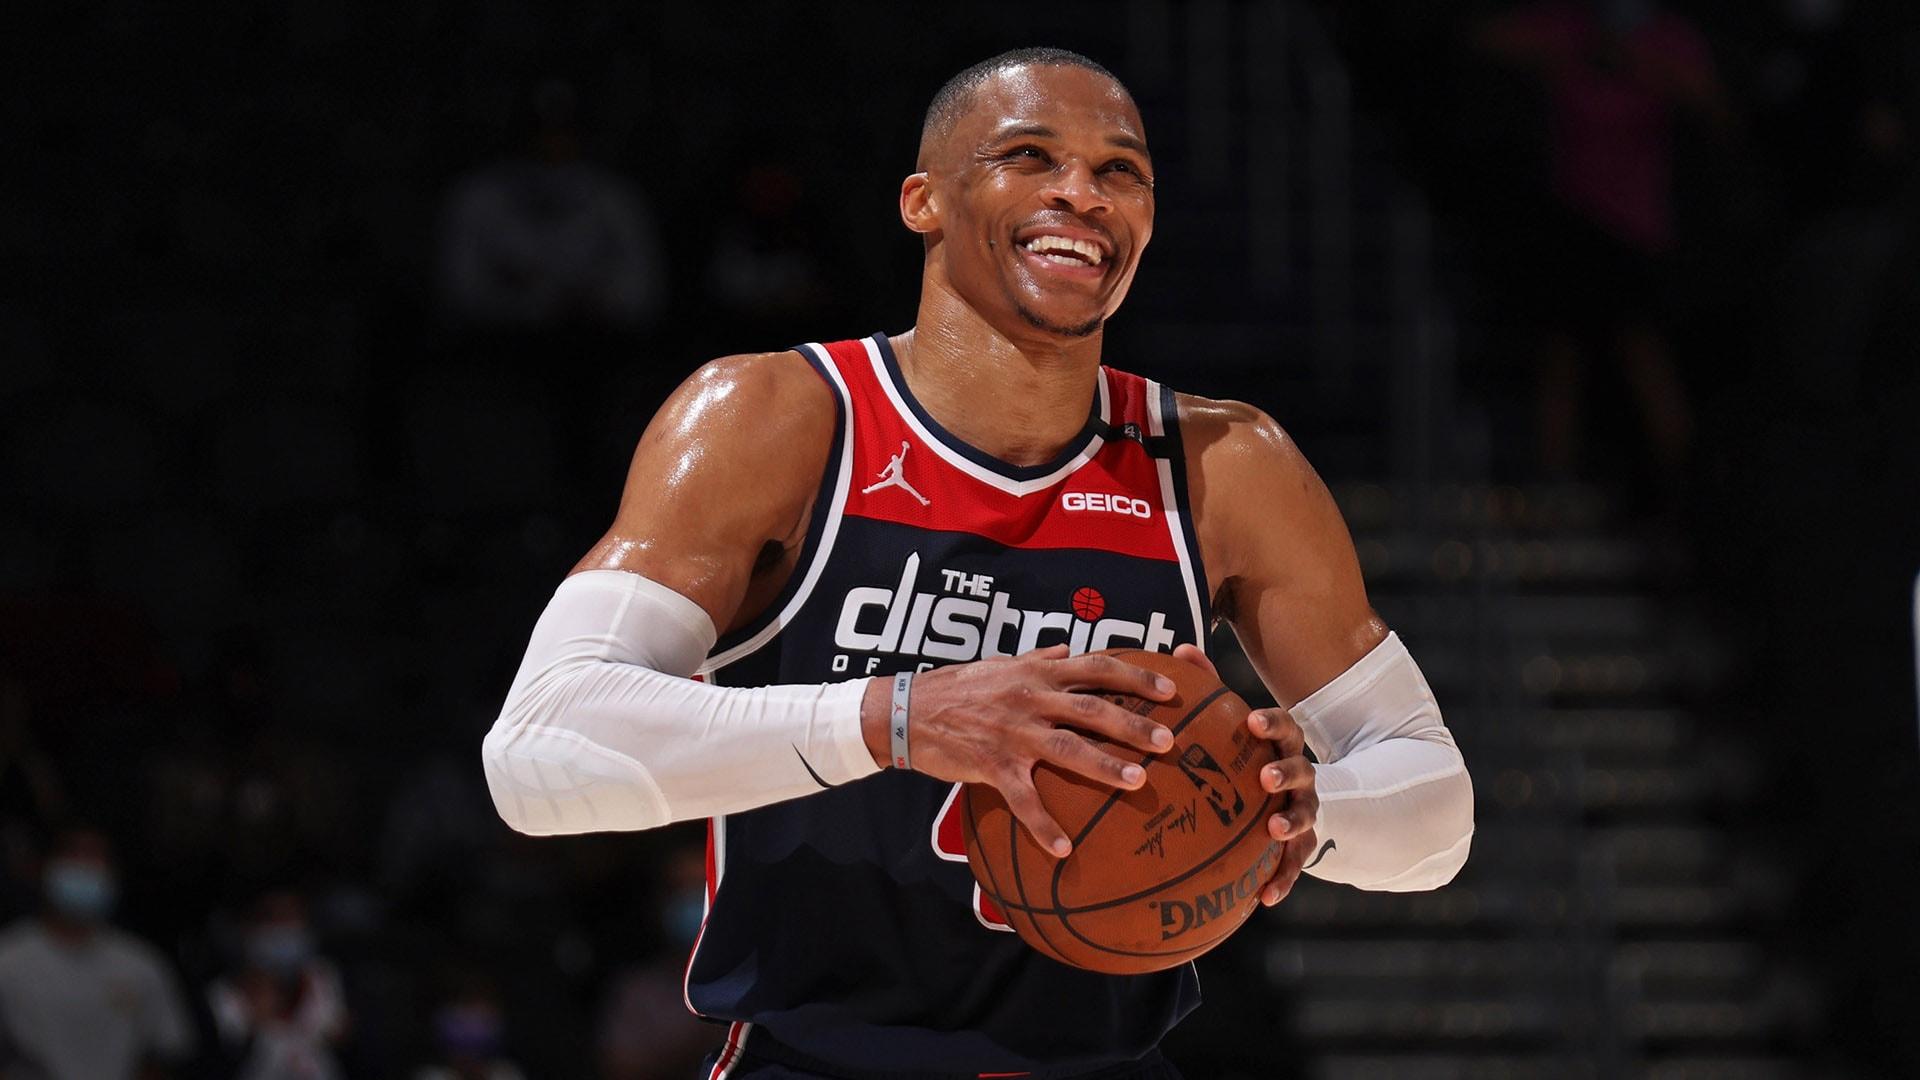 Westbrook's career triple-double journey